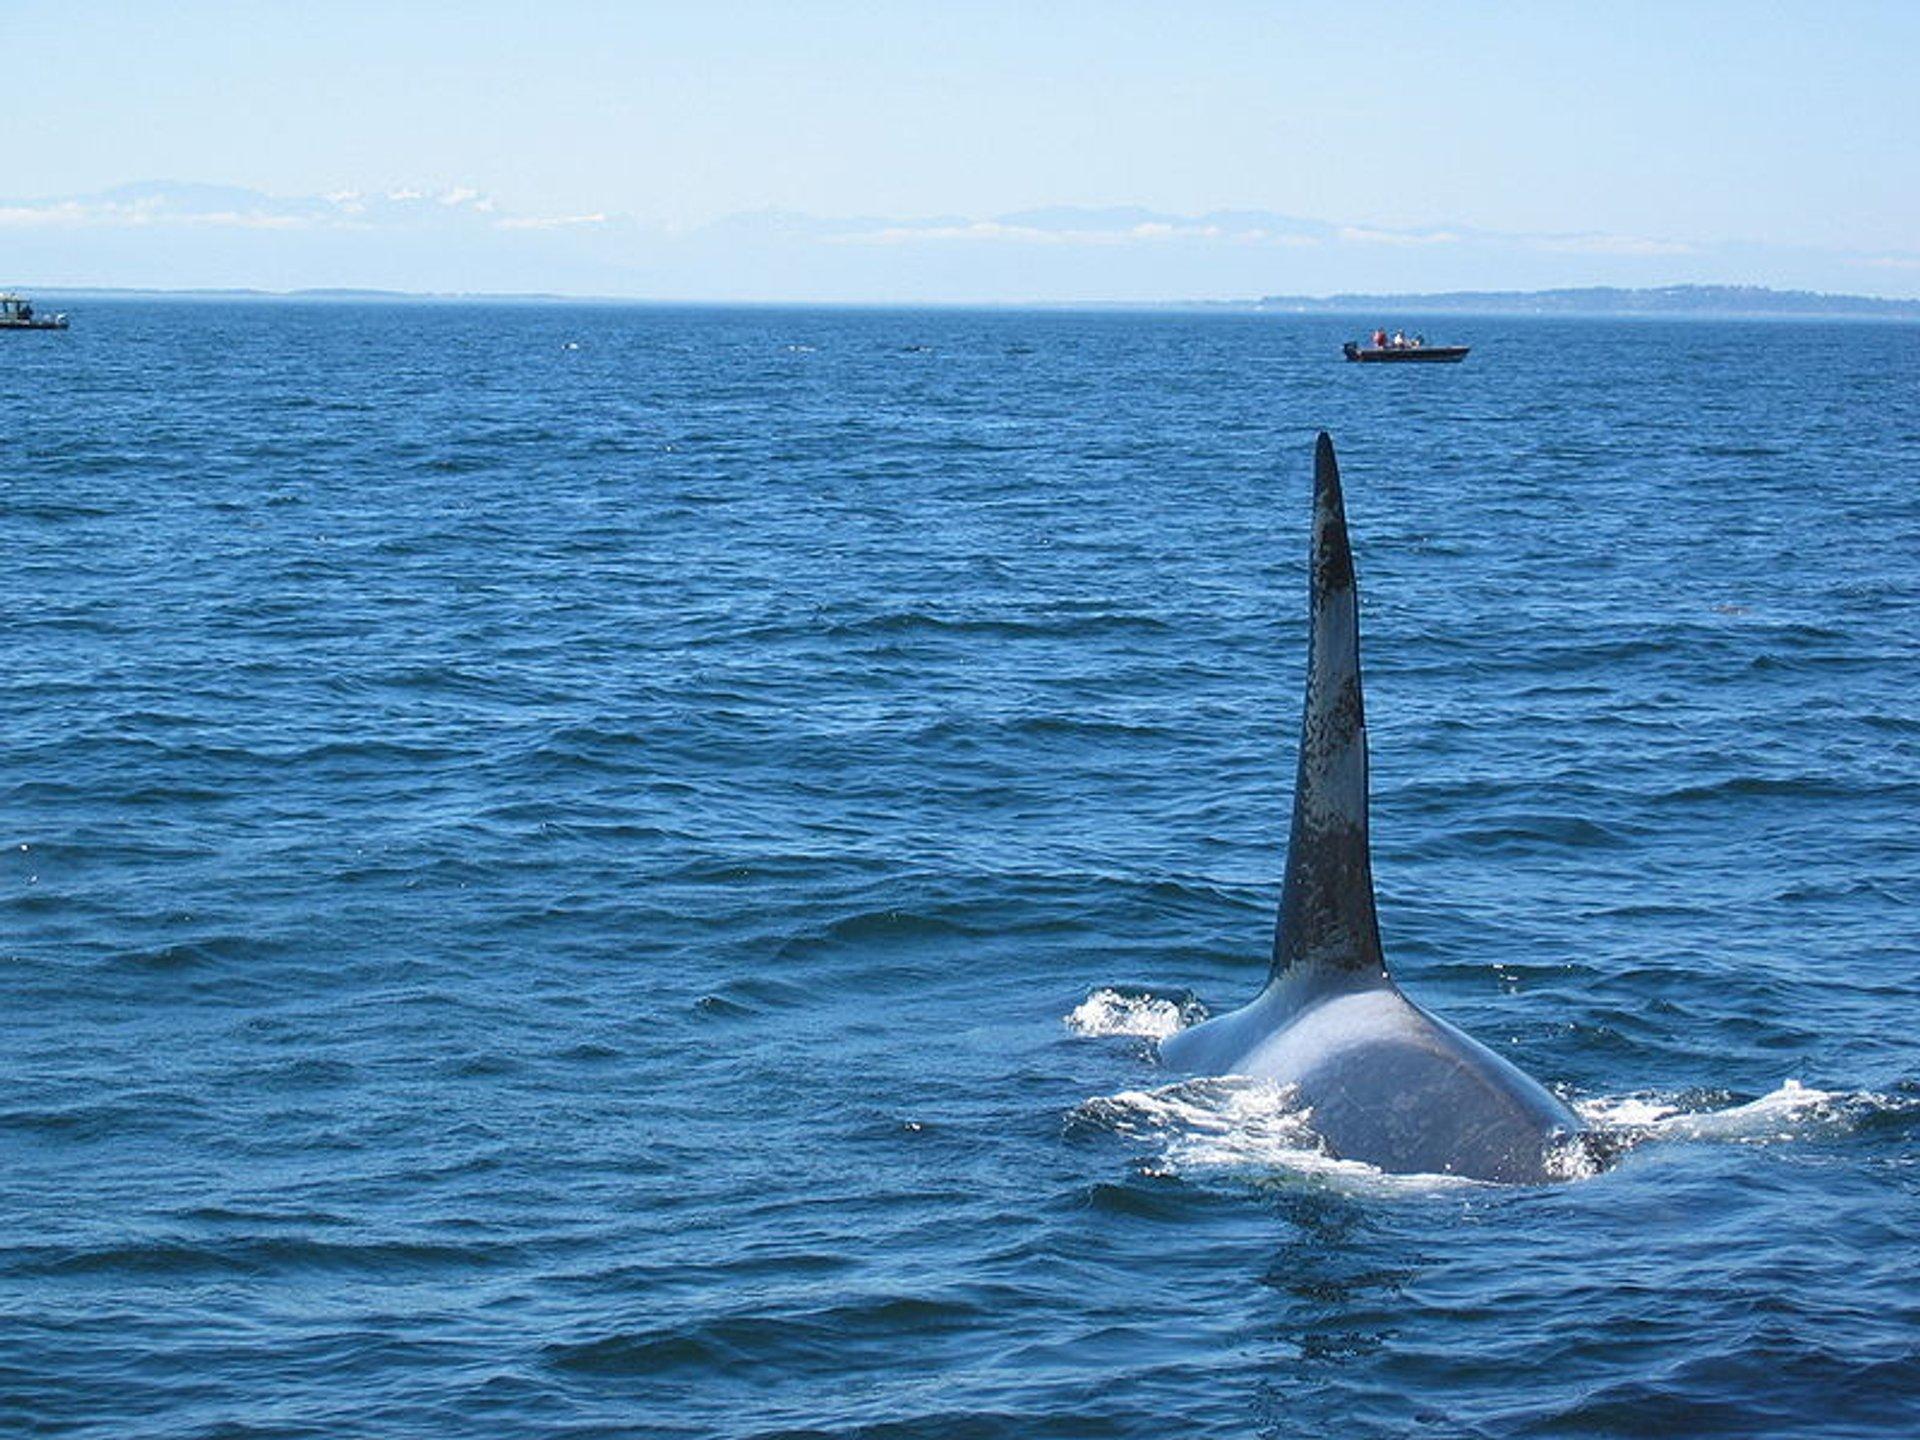 Bull Killer Whale near Victoria 2020